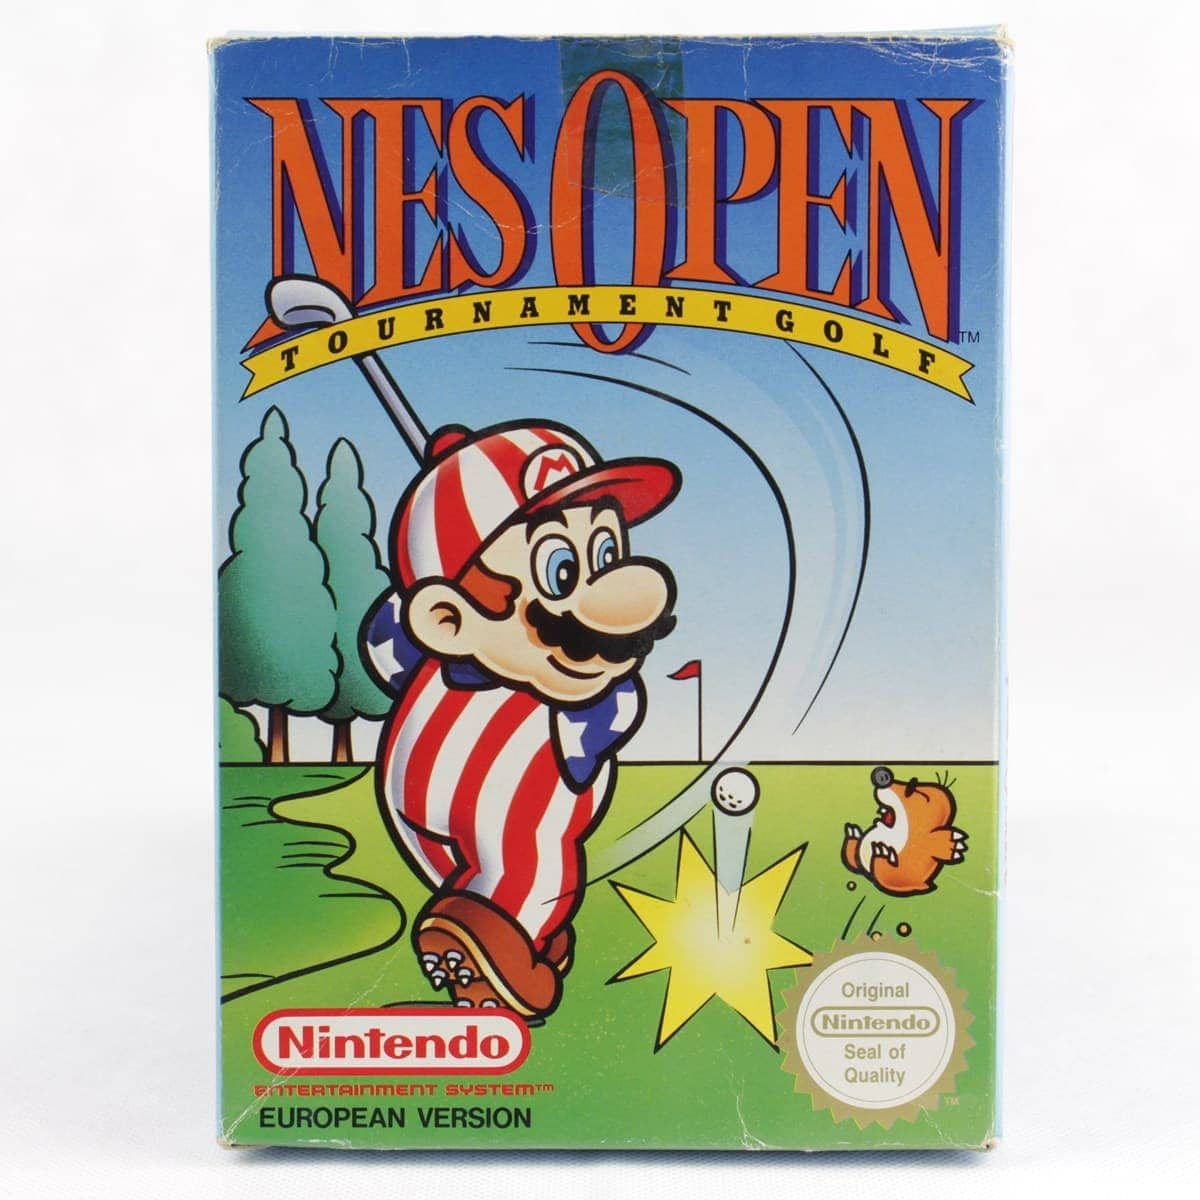 NES Open Tournament Golf (Nintendo NES, Boxed, PAL-B, SCN)